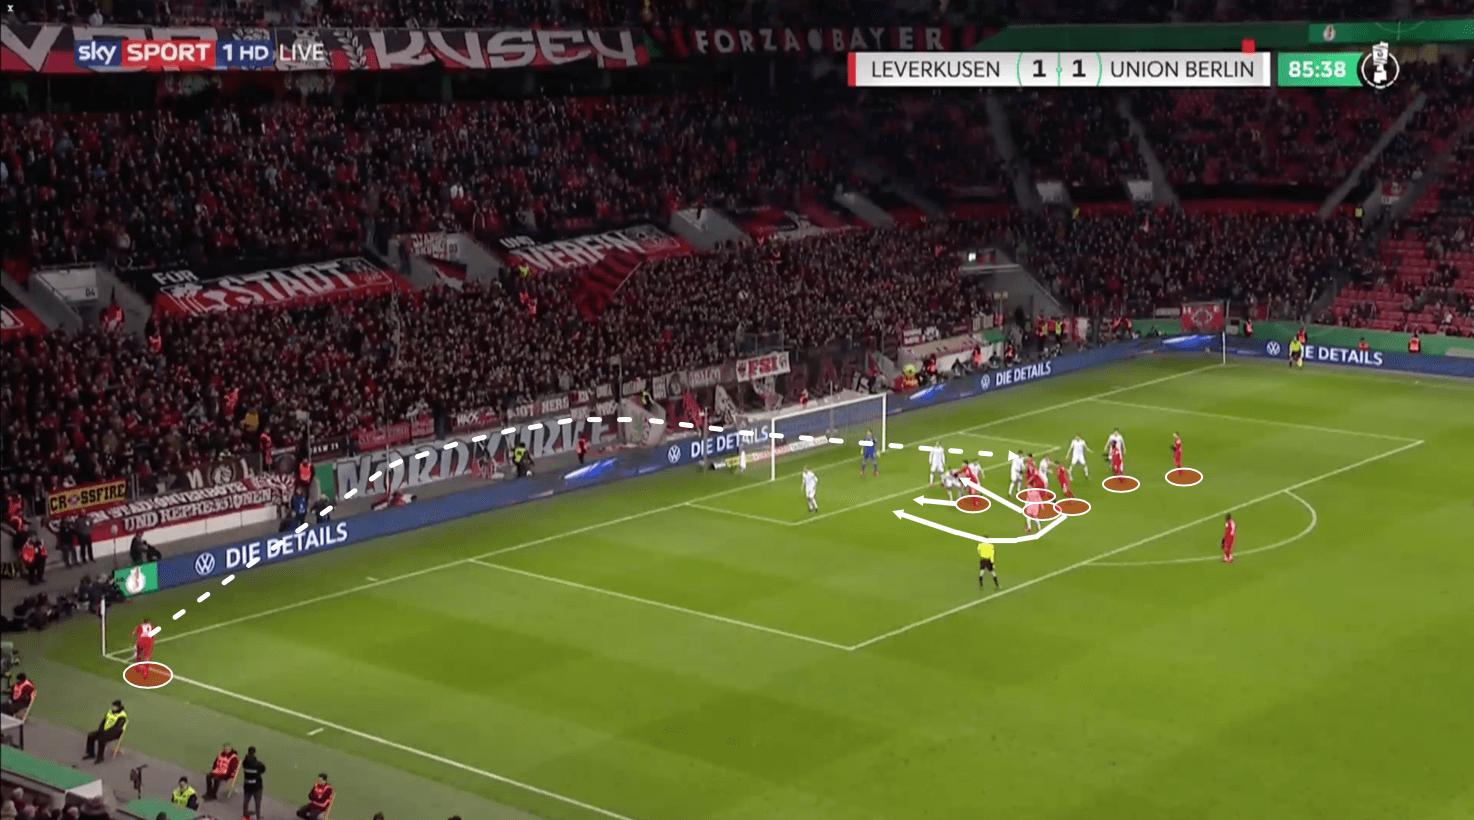 DFB Pokal 2019/20: Bayer Leverkusen vs Union Berlin - tactical analysis tactics